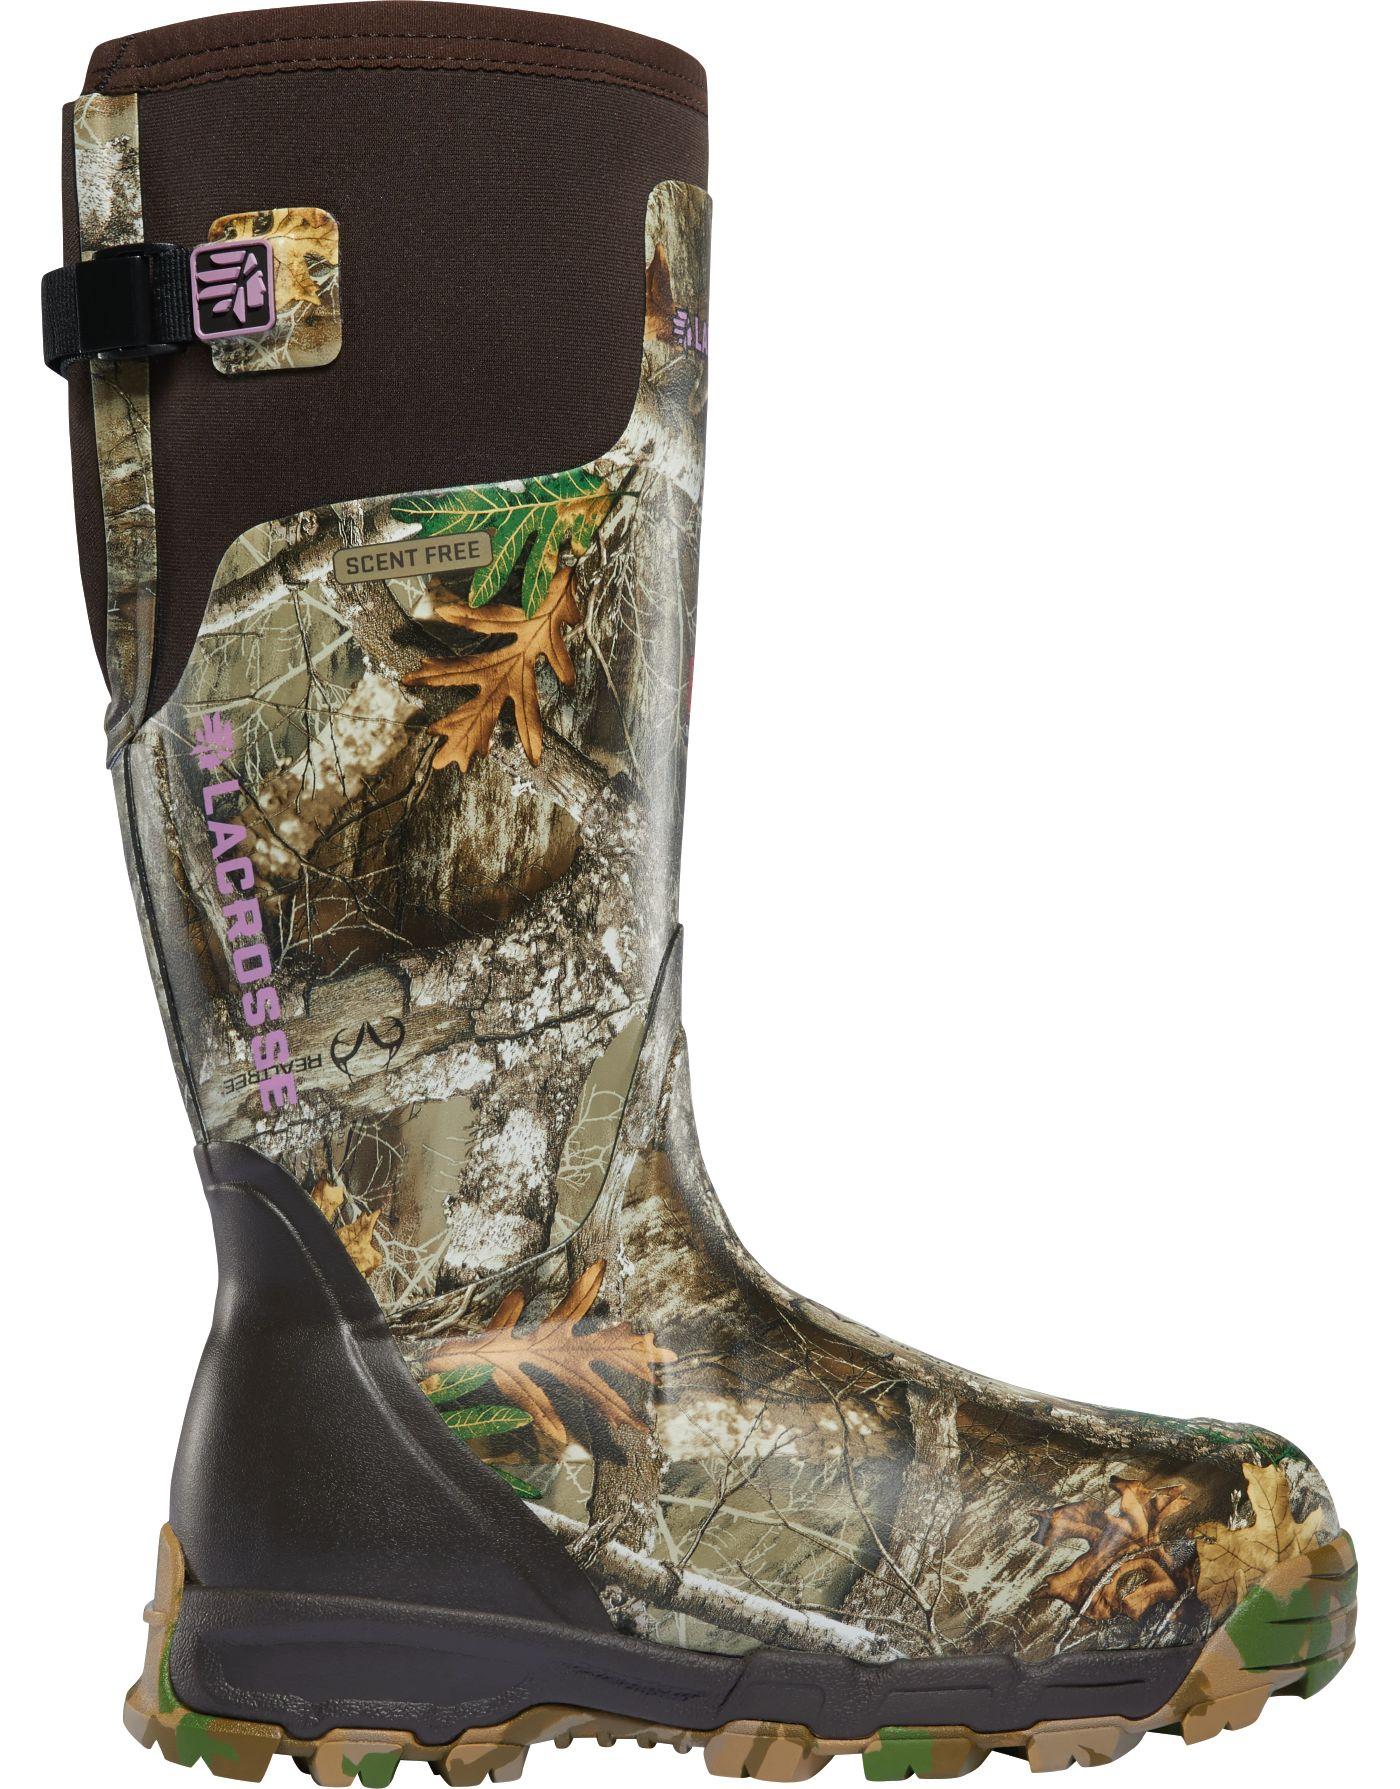 LaCrosse Women's Alphaburly Pro 15'' Realtree Edge 800g Hunting Boots